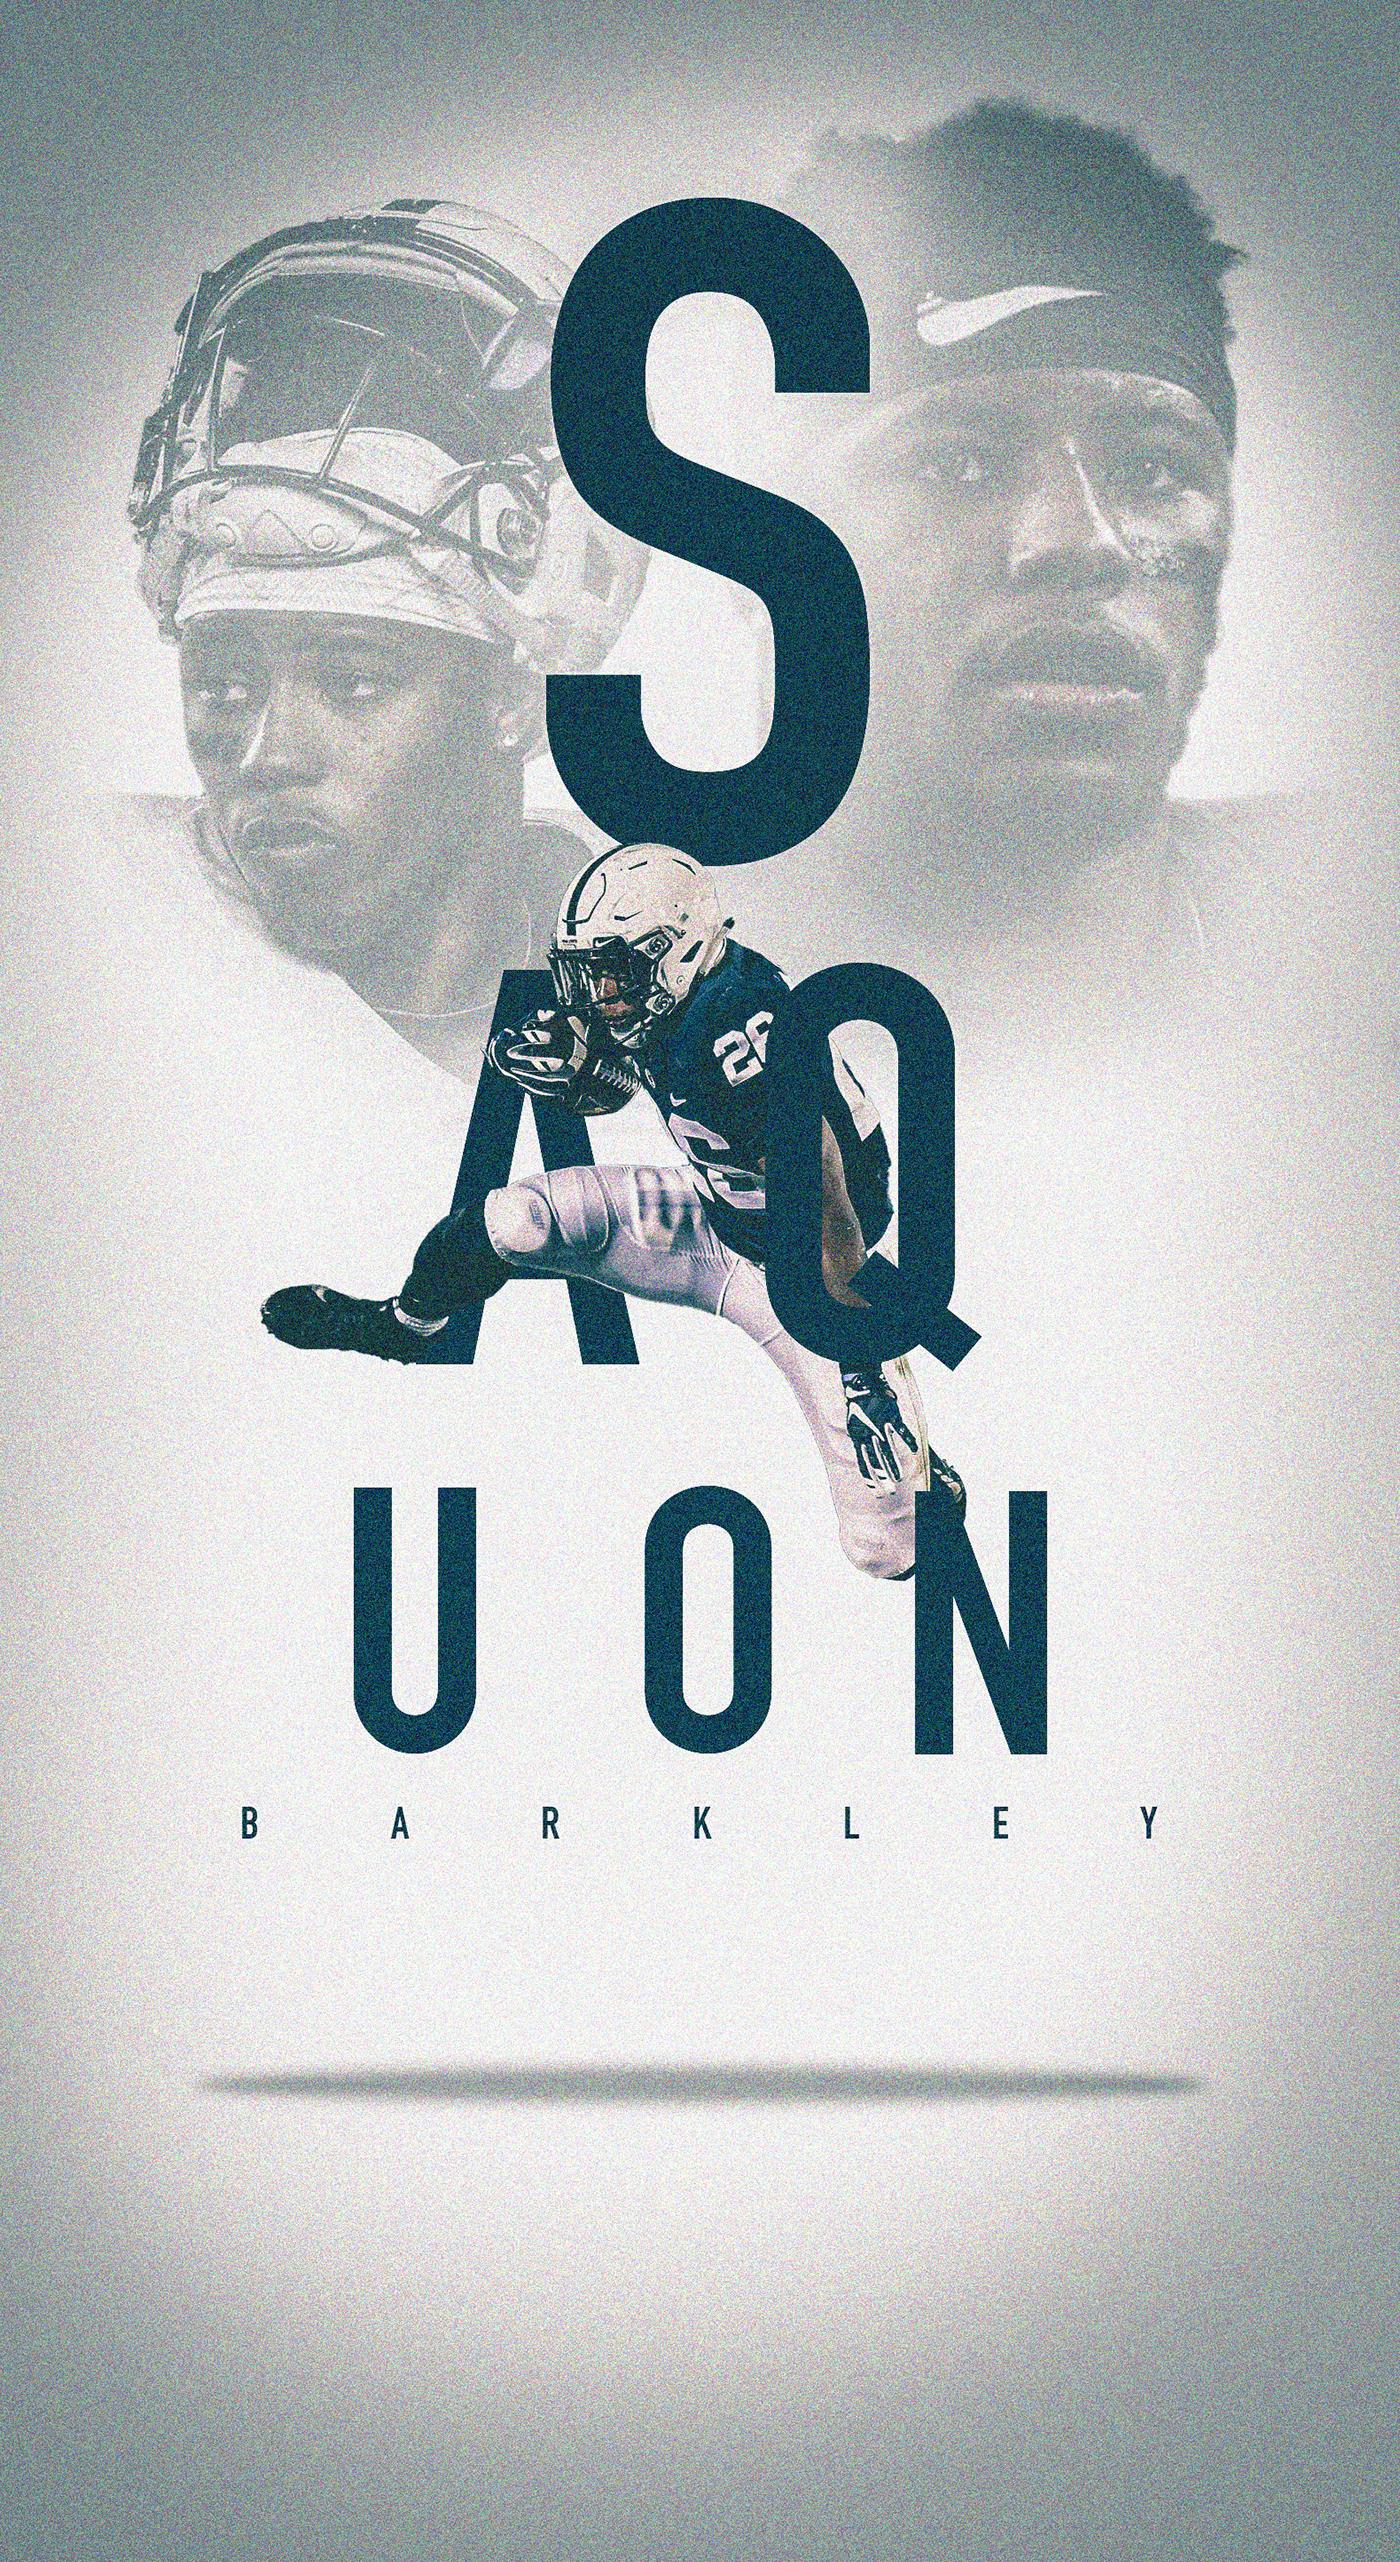 Saquon Barkley iOS Wallpaper on Behance Nfl football wallpaper 1400x2562